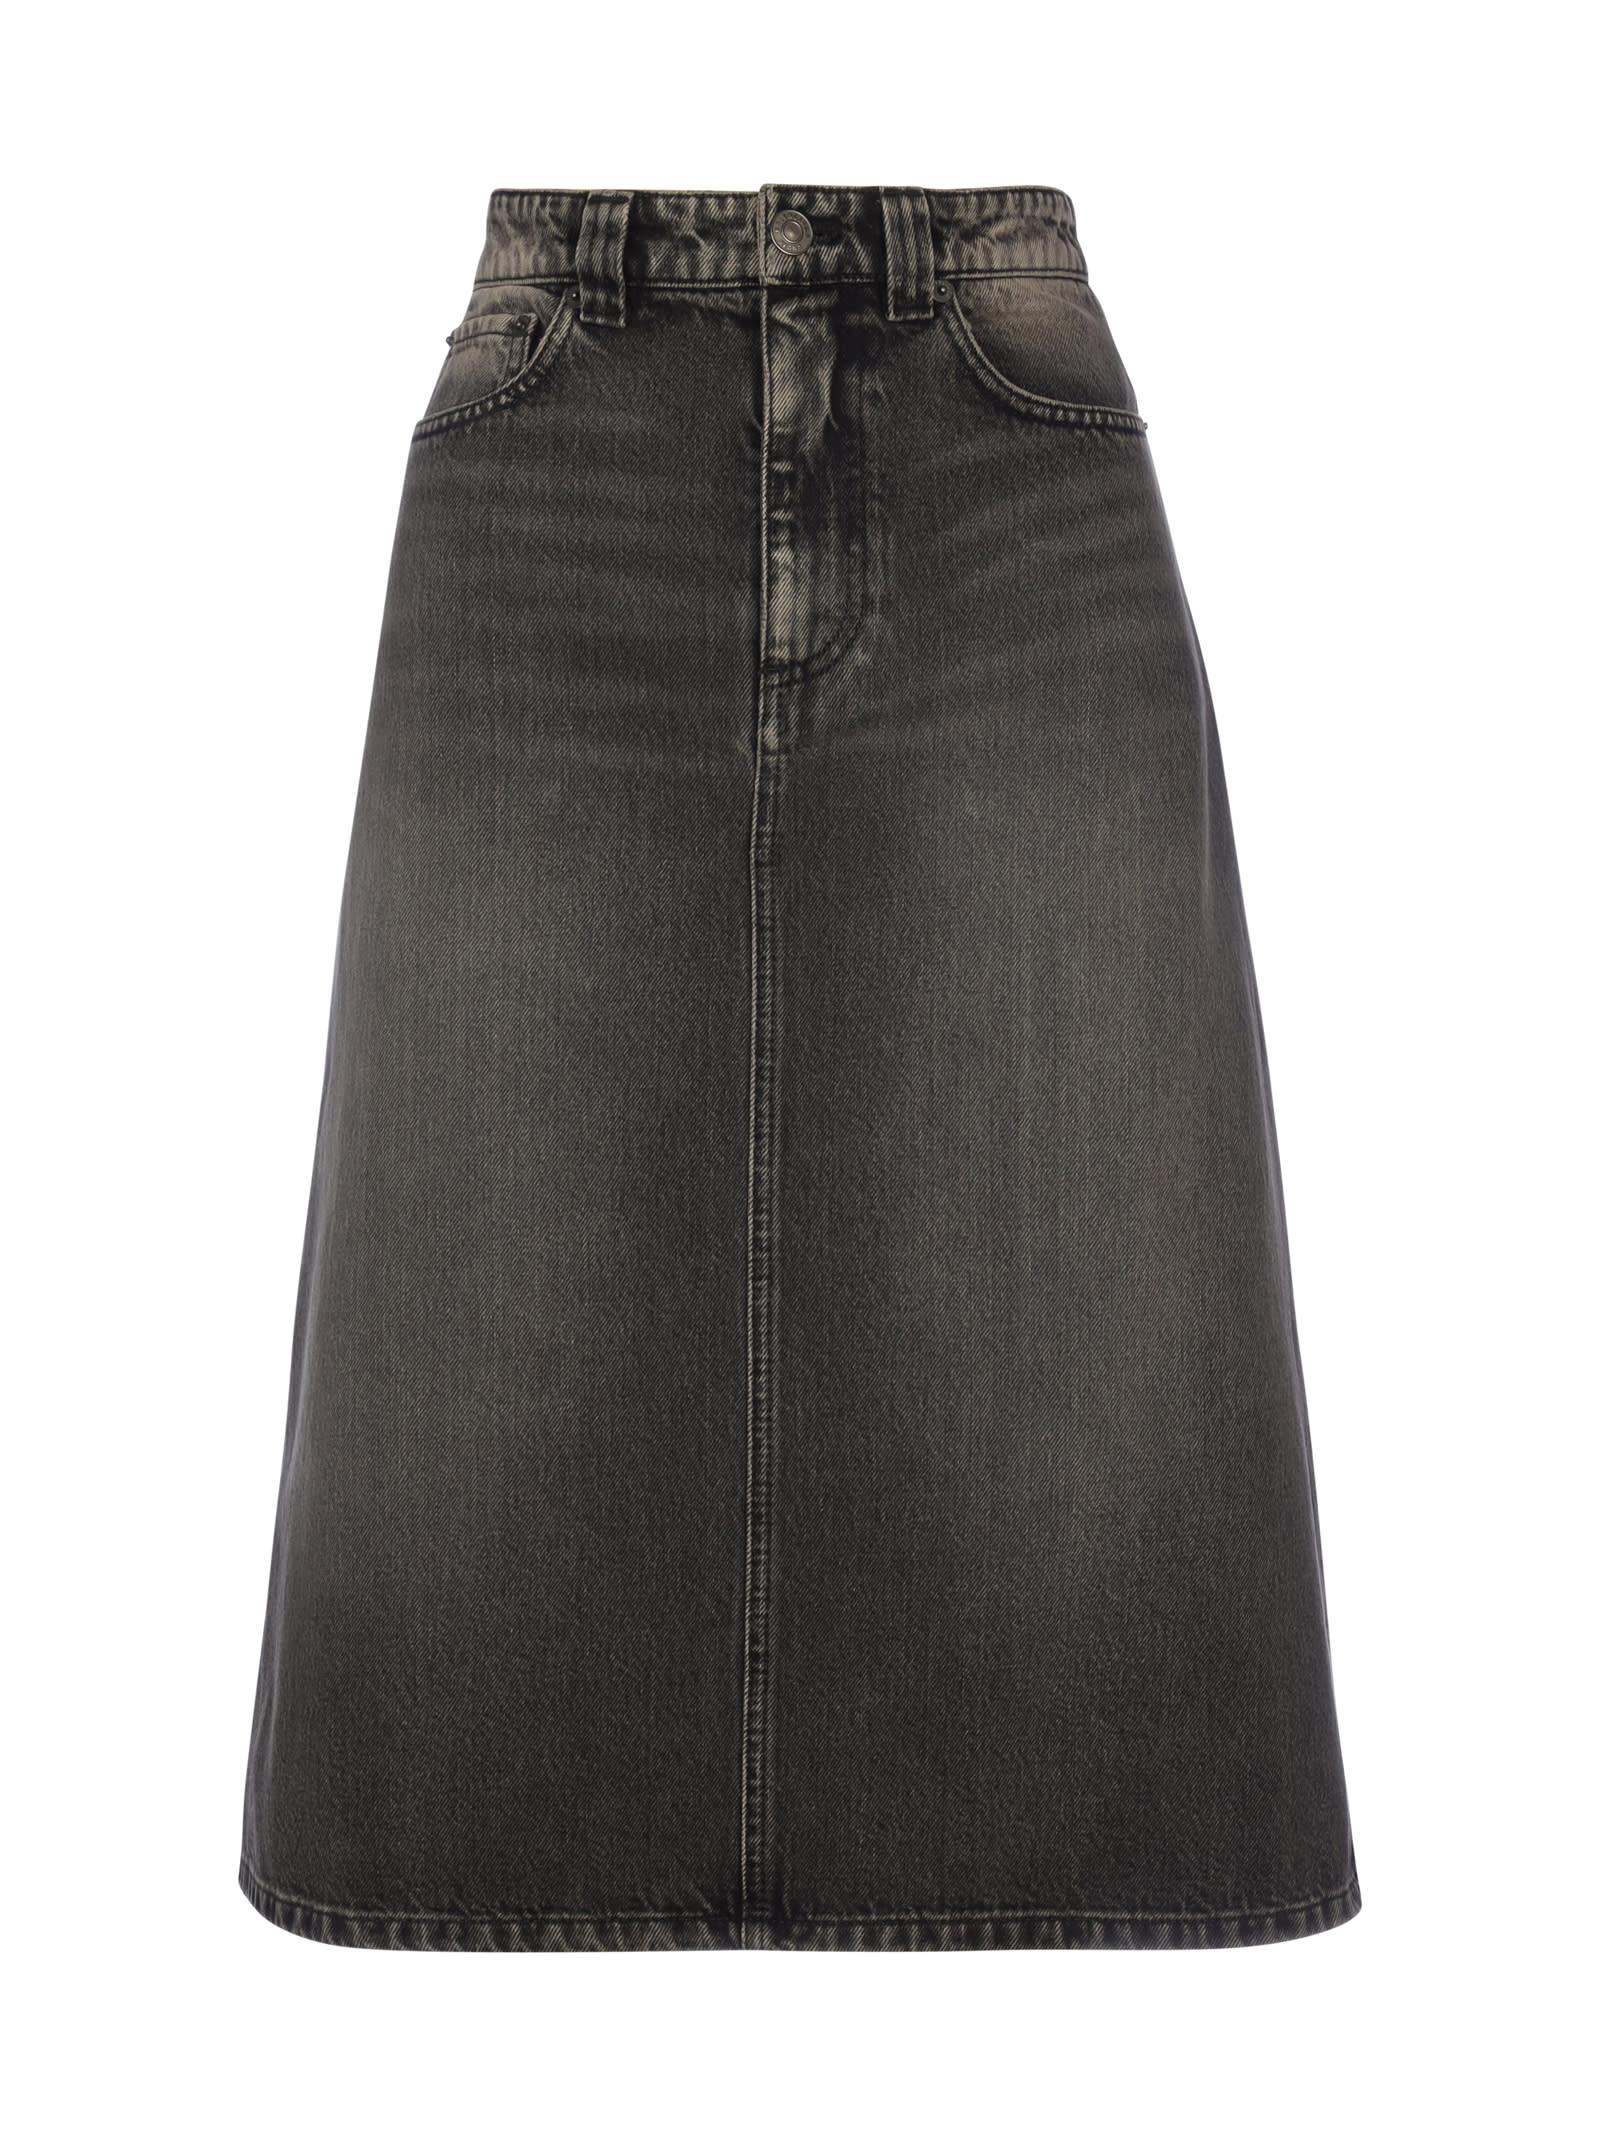 Balenciaga Pocket Skirt